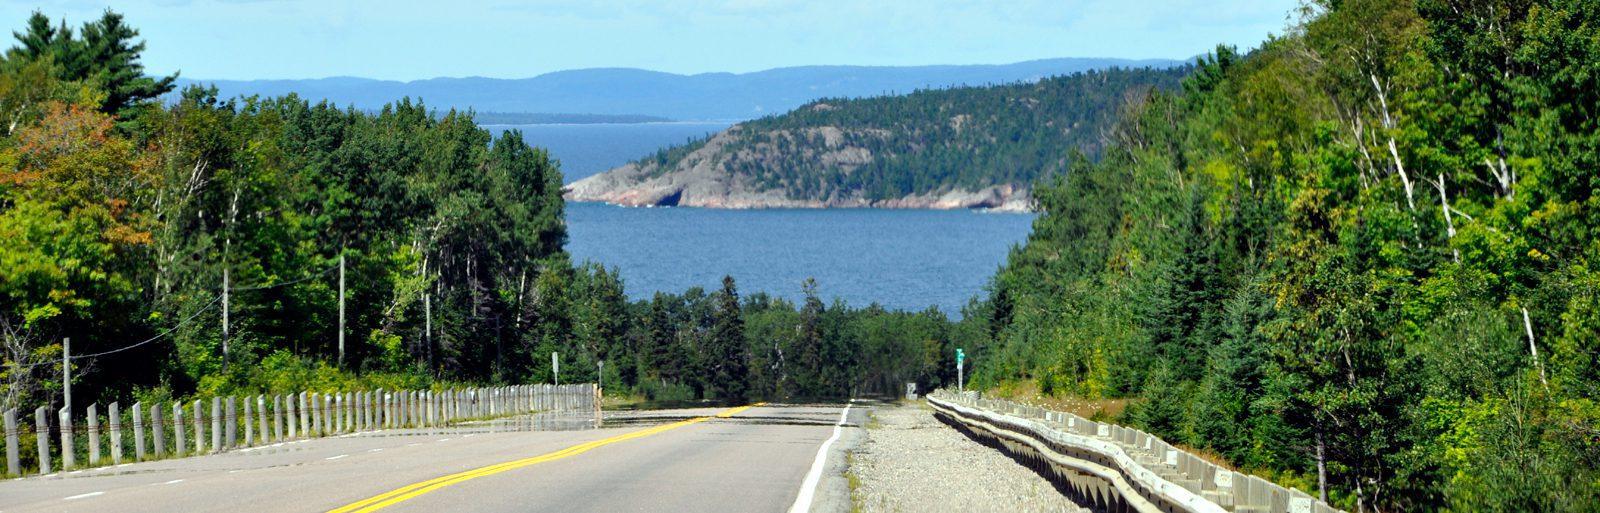 North of Sault Ste Marie- Pancake Bay